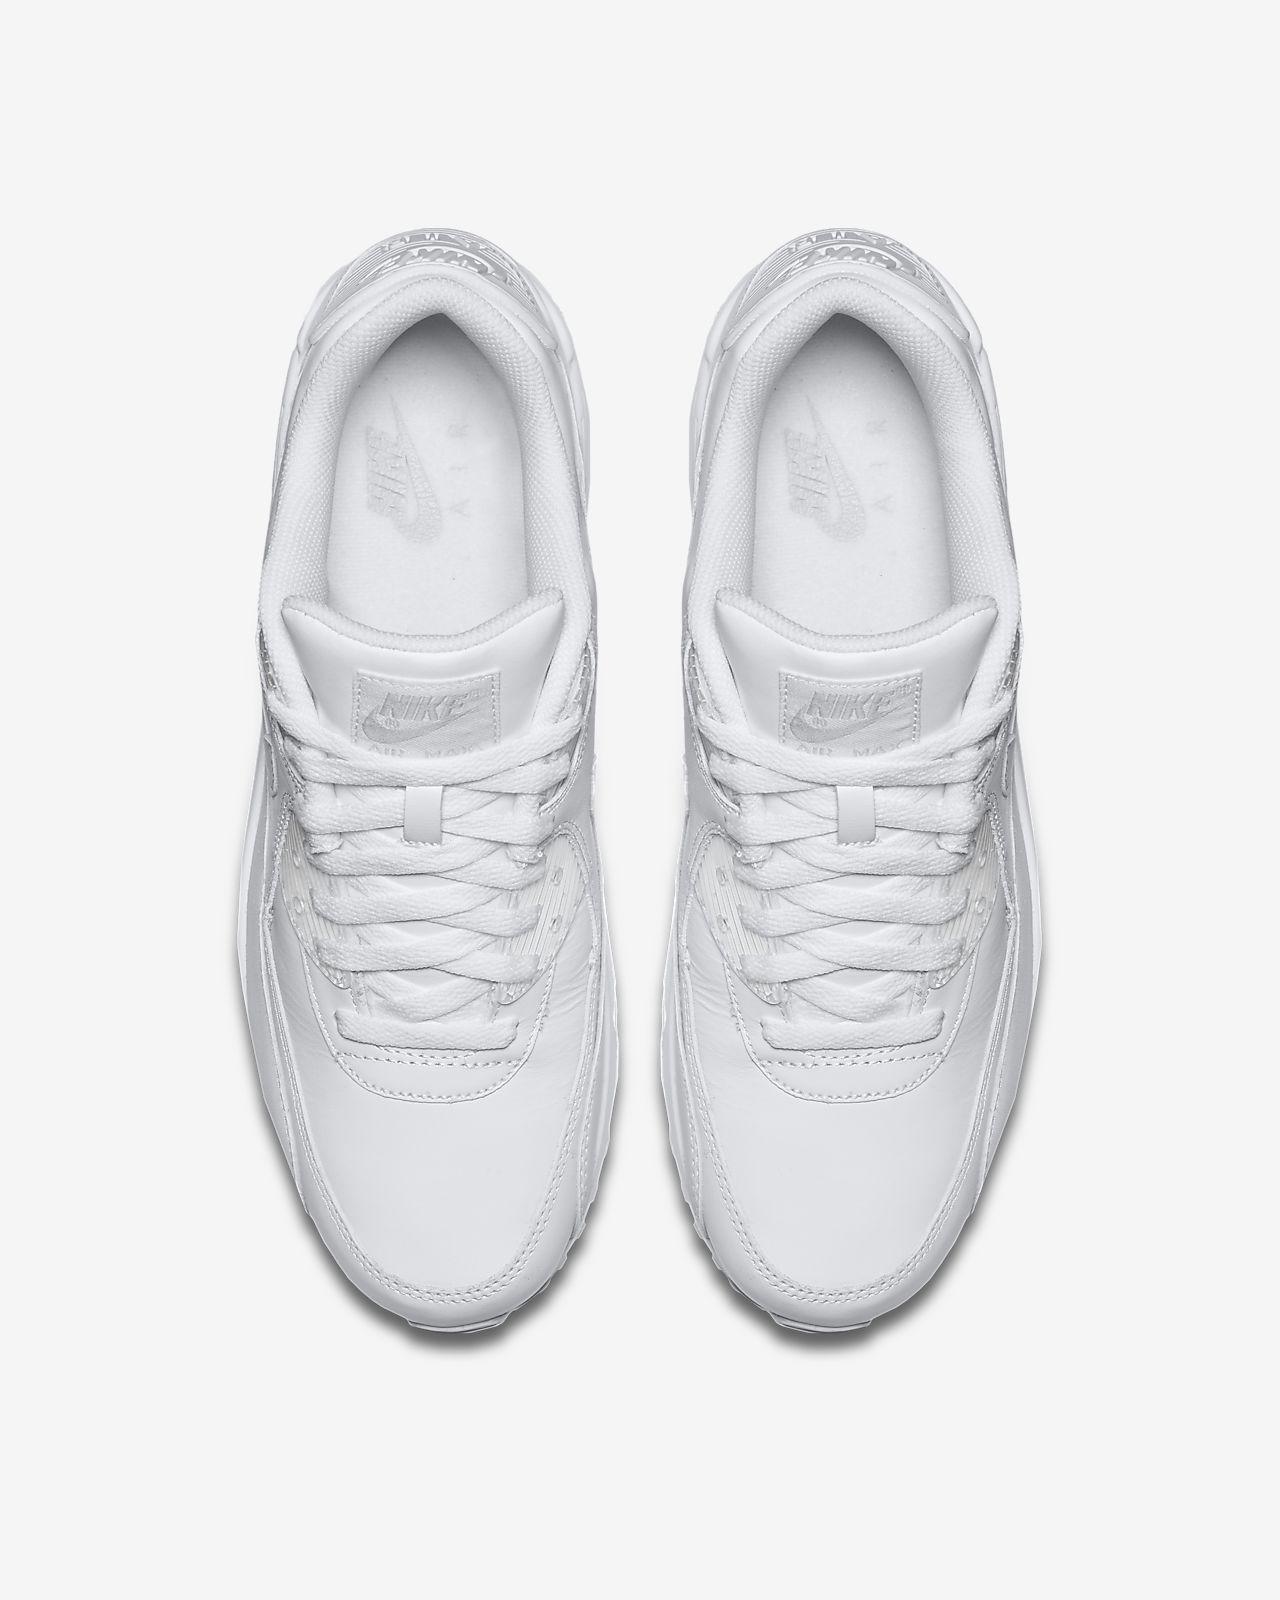 Calzado para hombre Nike Air Max 90 Leather